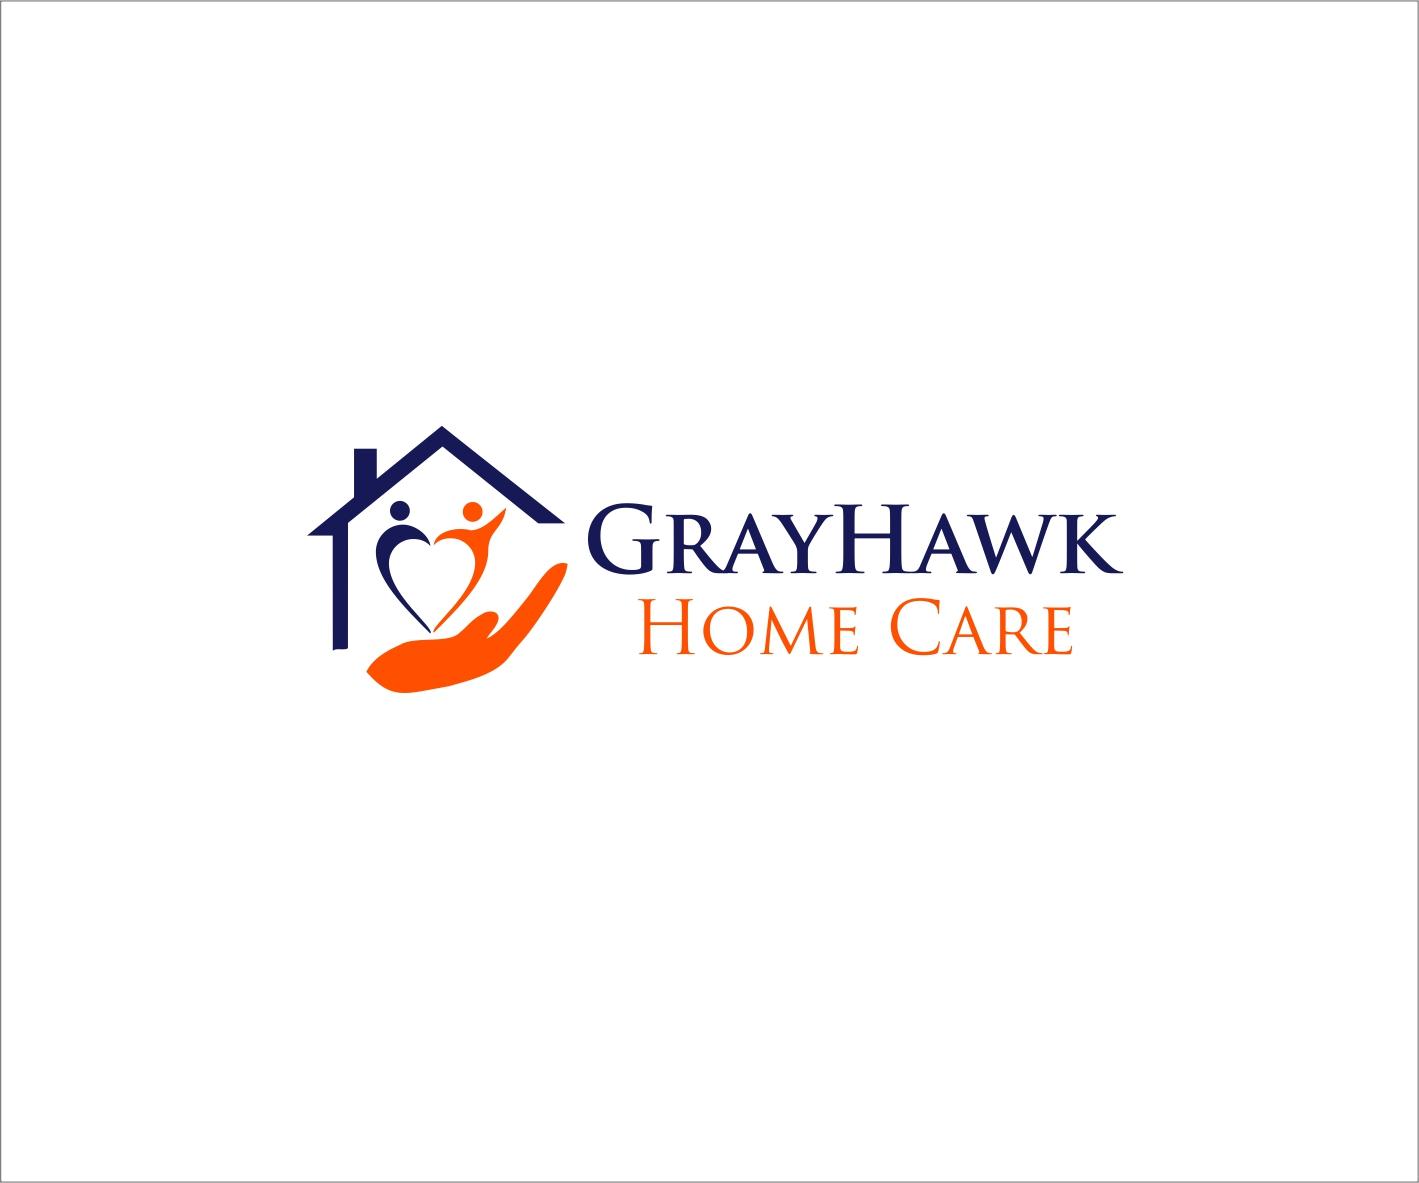 Feminine Serious Home Health Care Logo Design For Grayhawk Home Care By Andutza Design 6361819